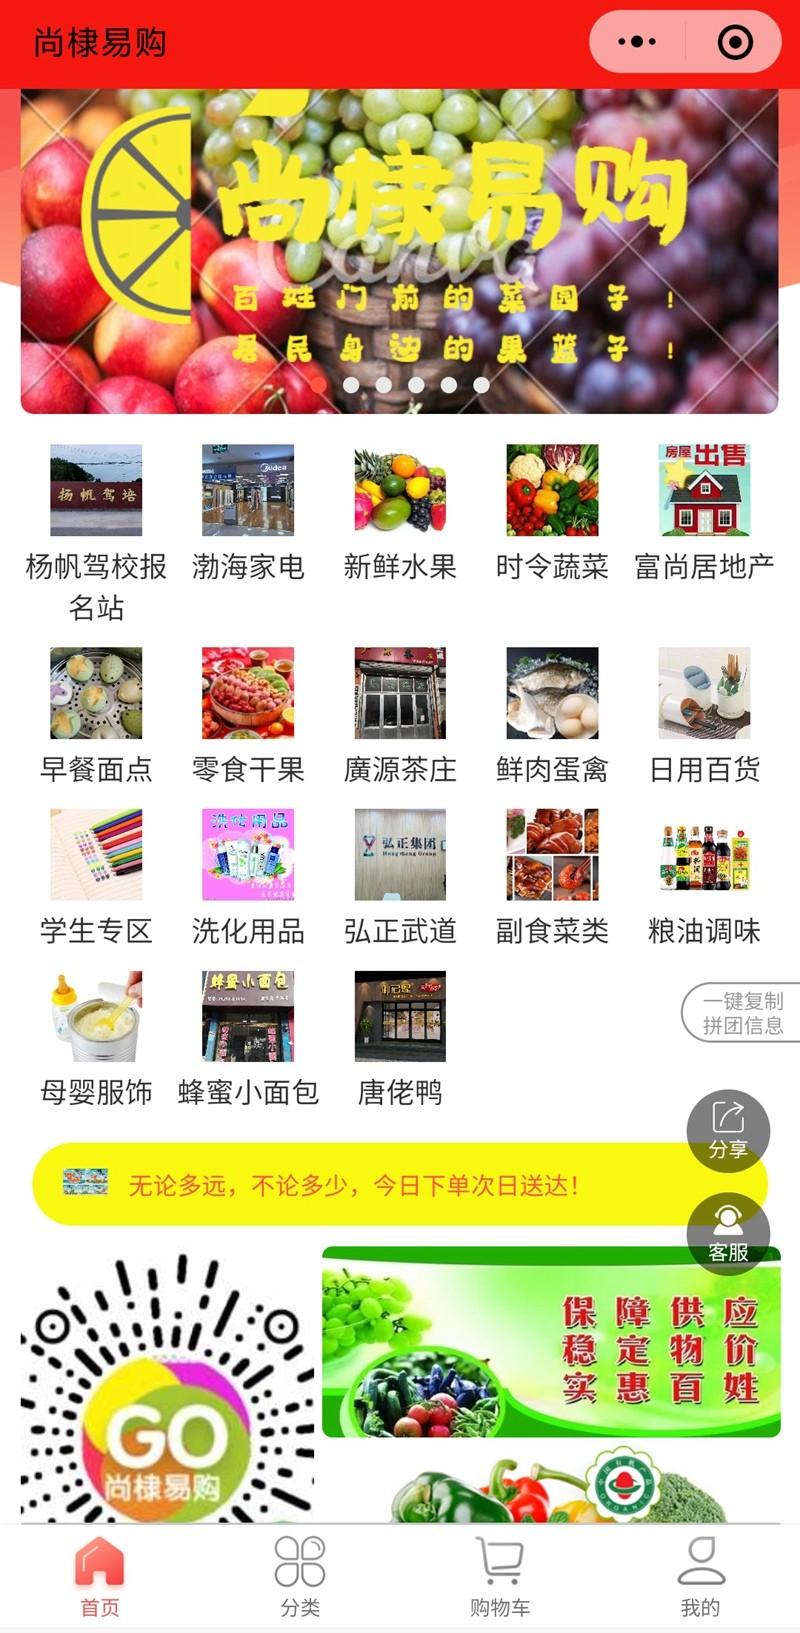 Screenshot_2021-06-23-13-05-14-653_com.tencent.mm.jpg